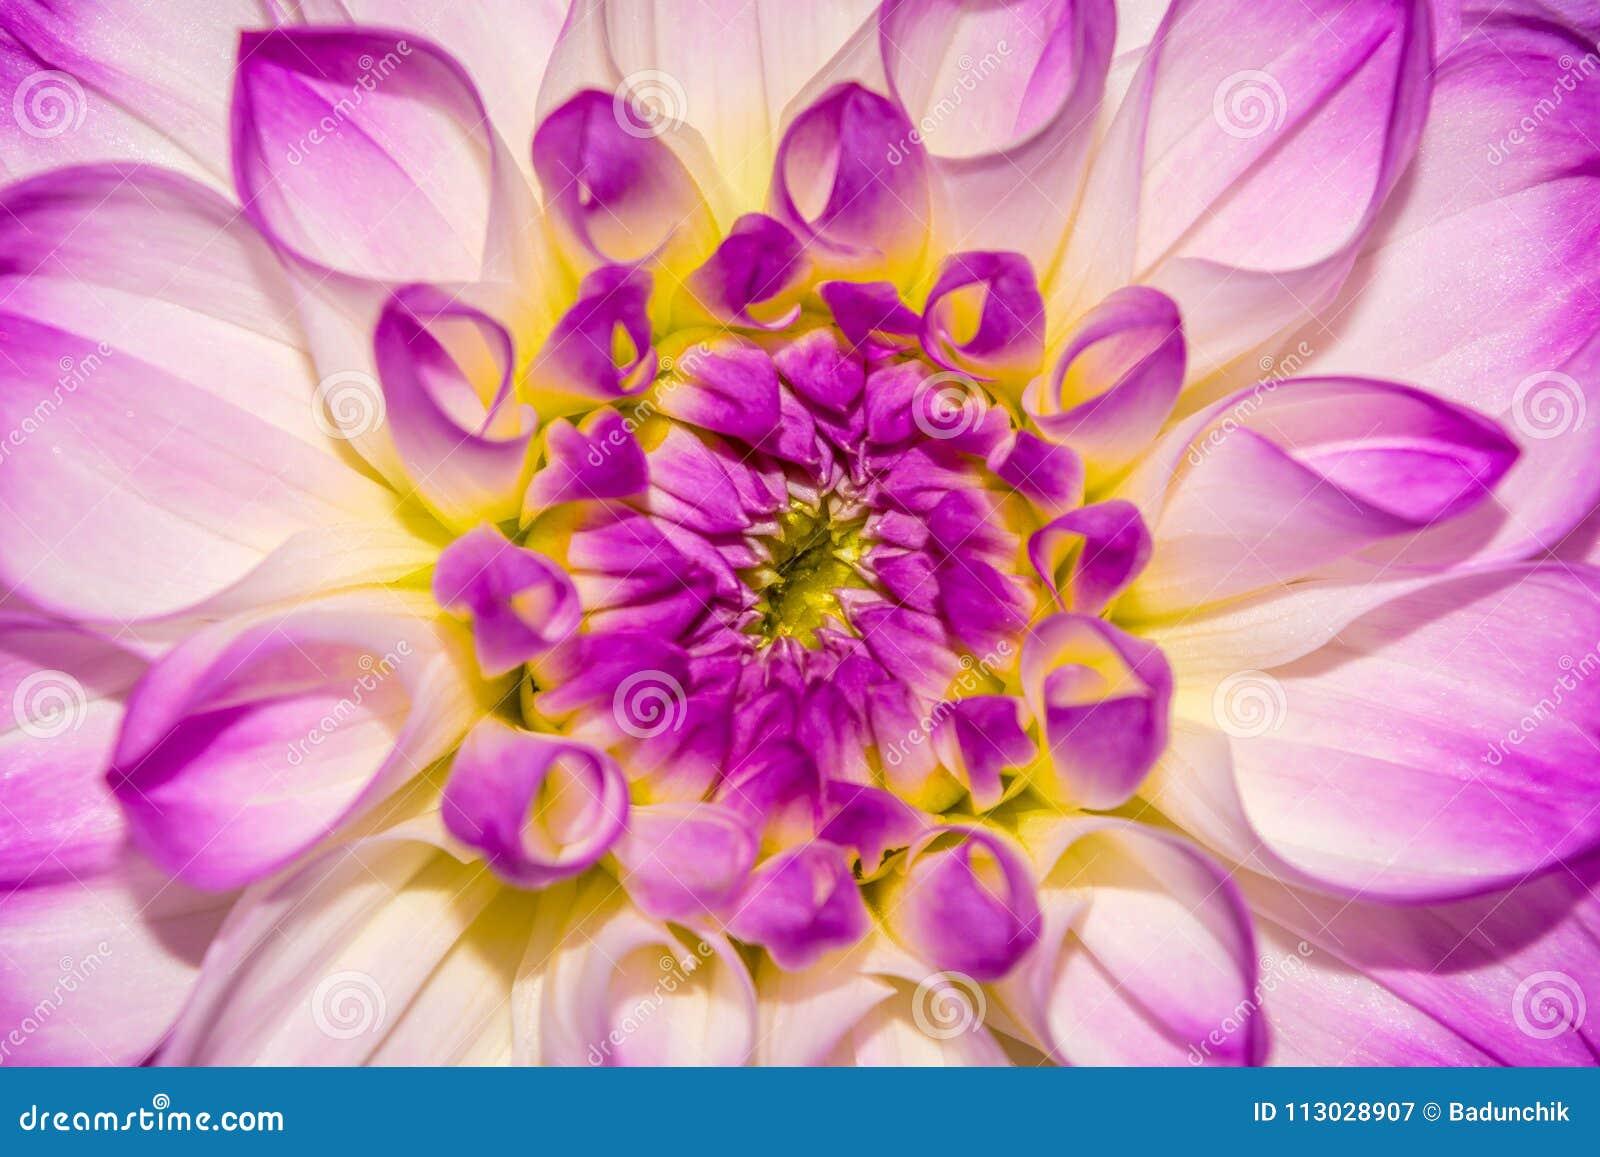 Foto del fondo de la flor del extracto del primer, una textura de la flor